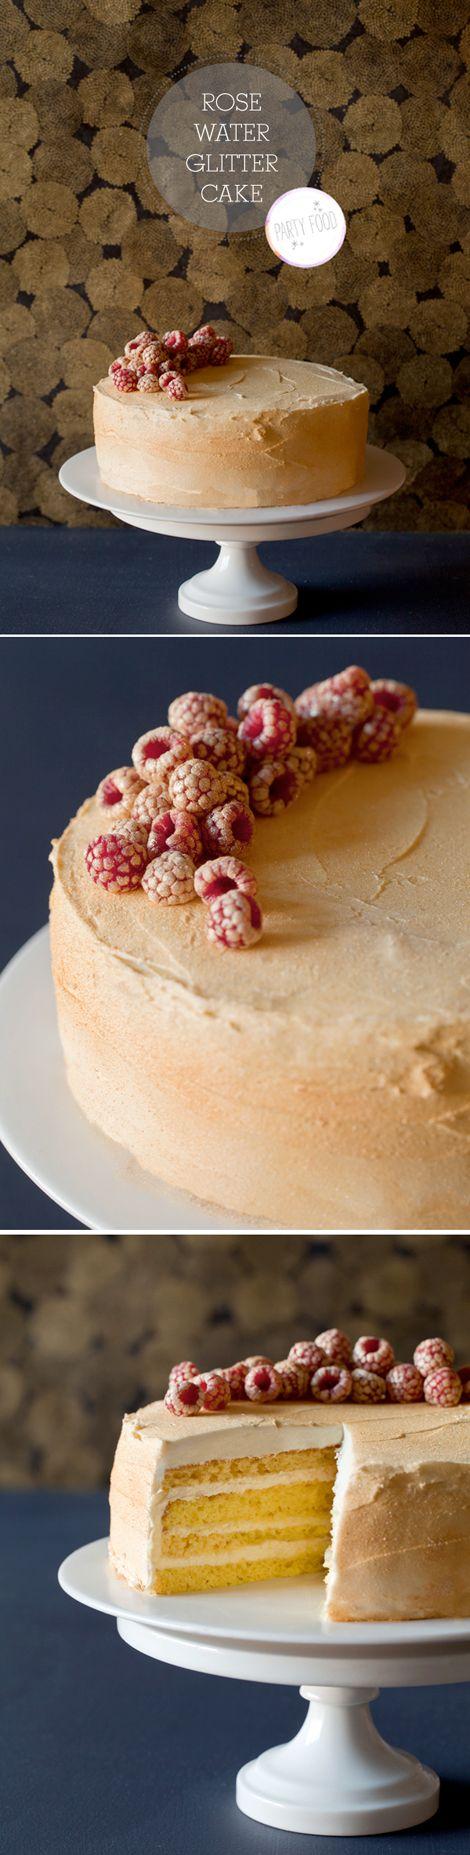 rosewater glitter cake